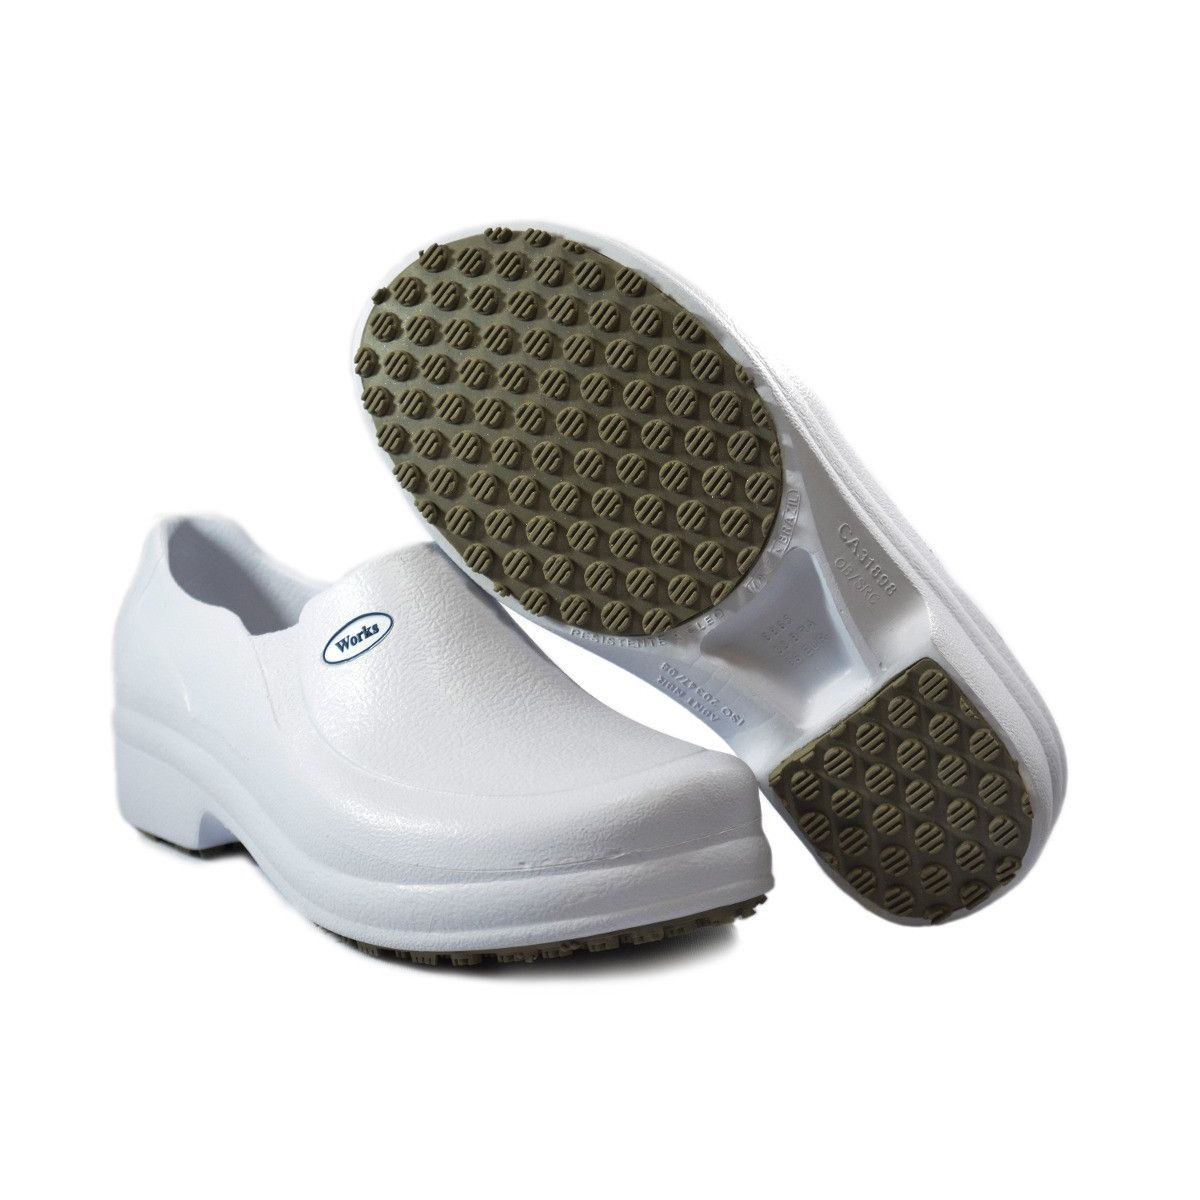 Sapato Soft Works Profissional Antiderrapante